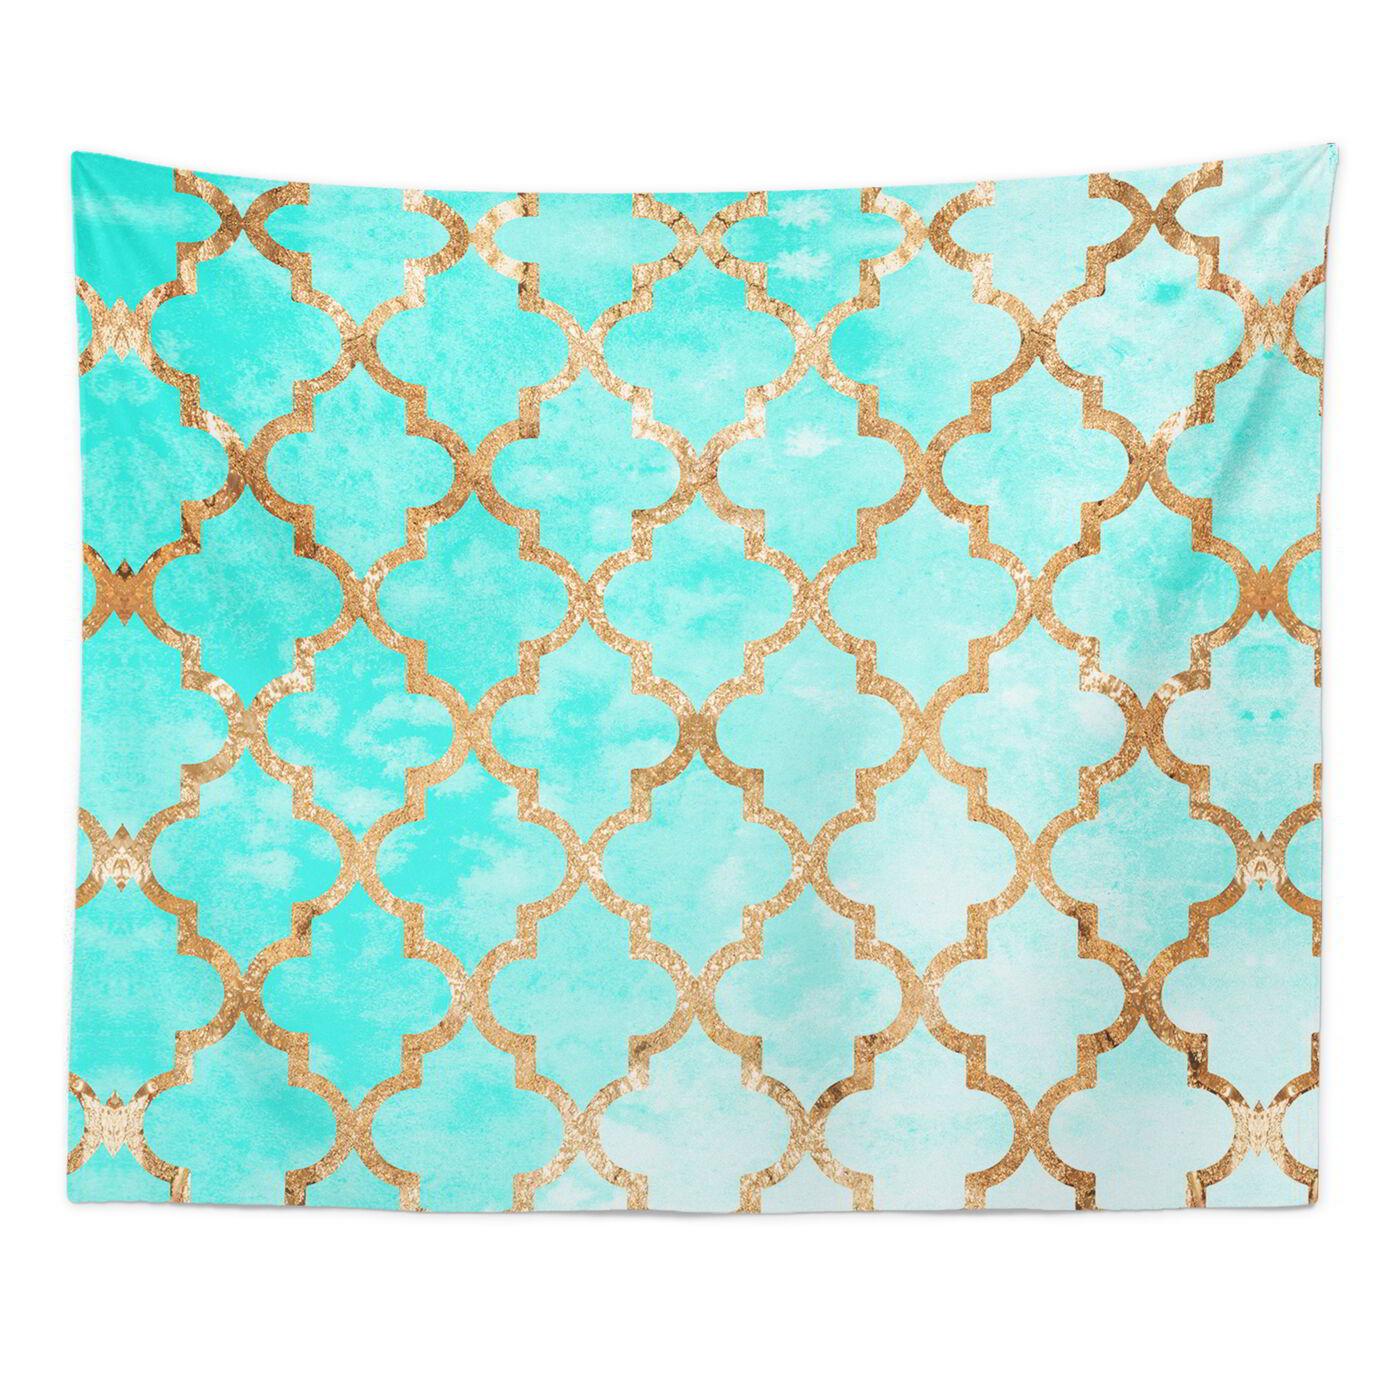 Arabesque Turquoise Tapestry Art